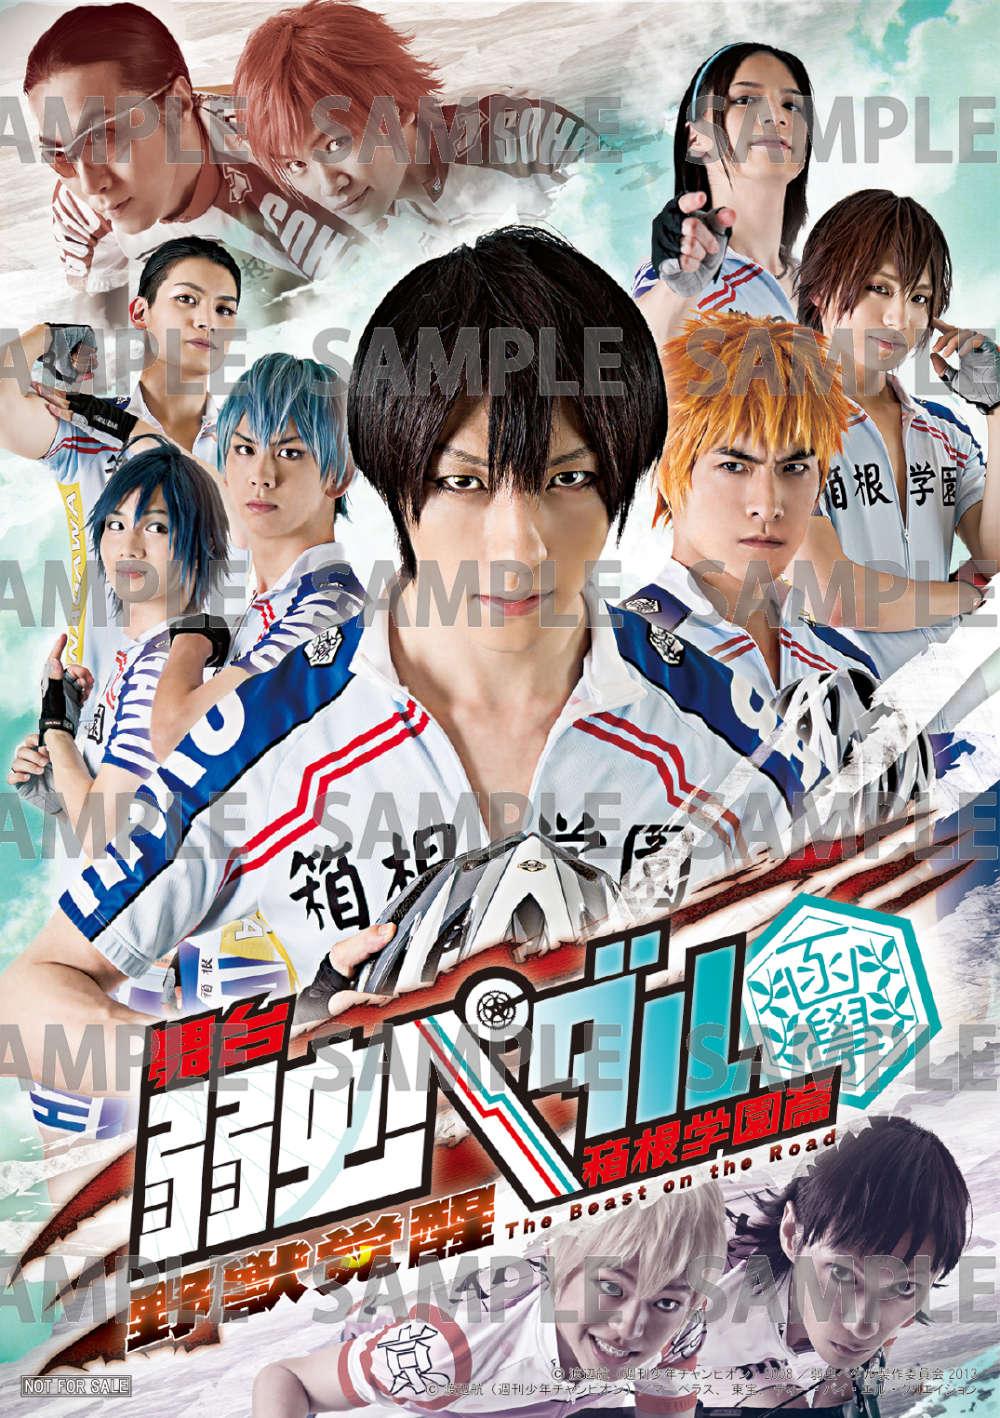 舞台『弱虫ペダル』箱根学園篇 〜野獣覚醒〜 DVD